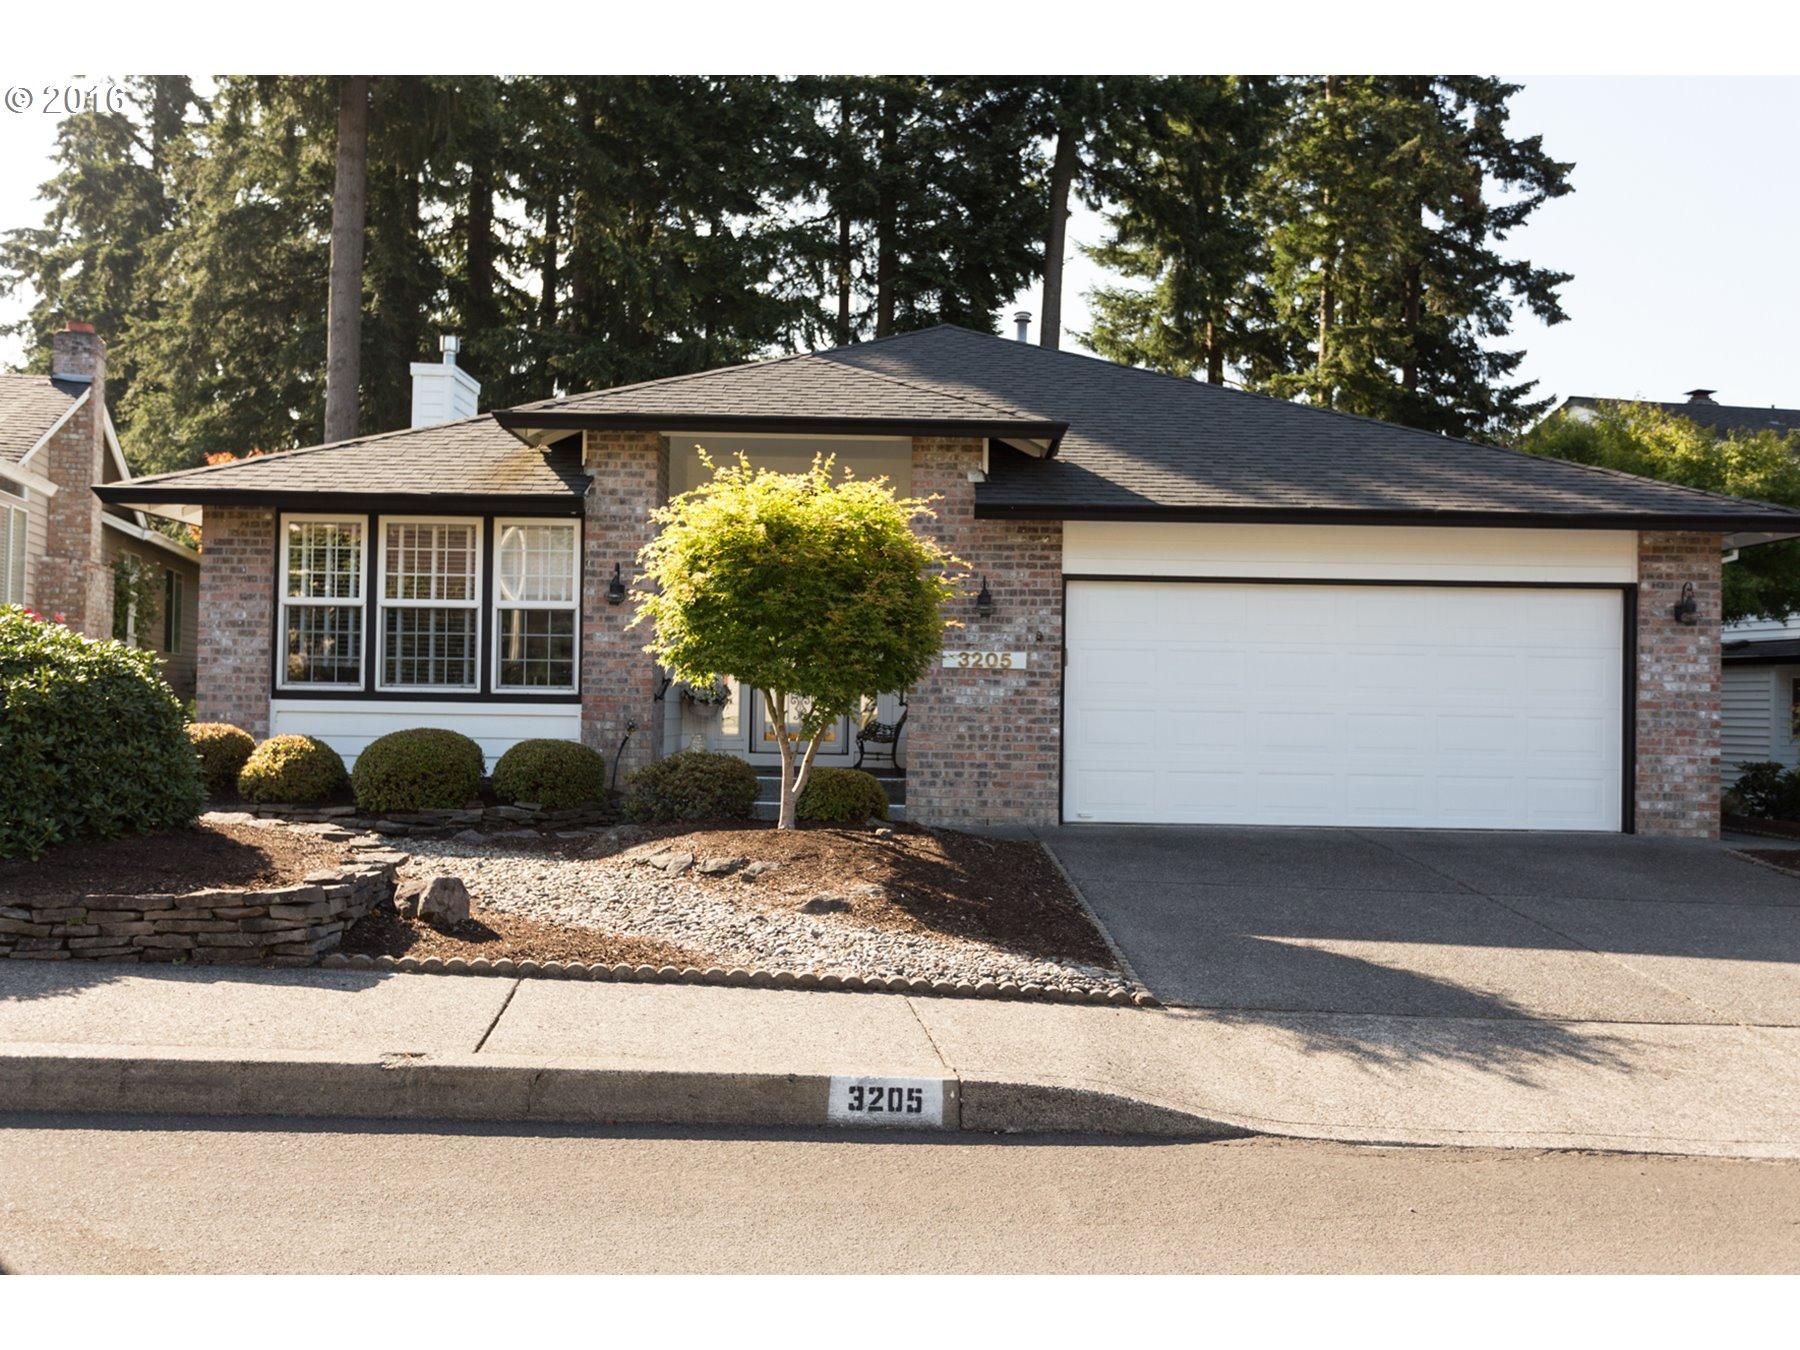 3205 SE SPYGLASS DR, Vancouver, WA 98683